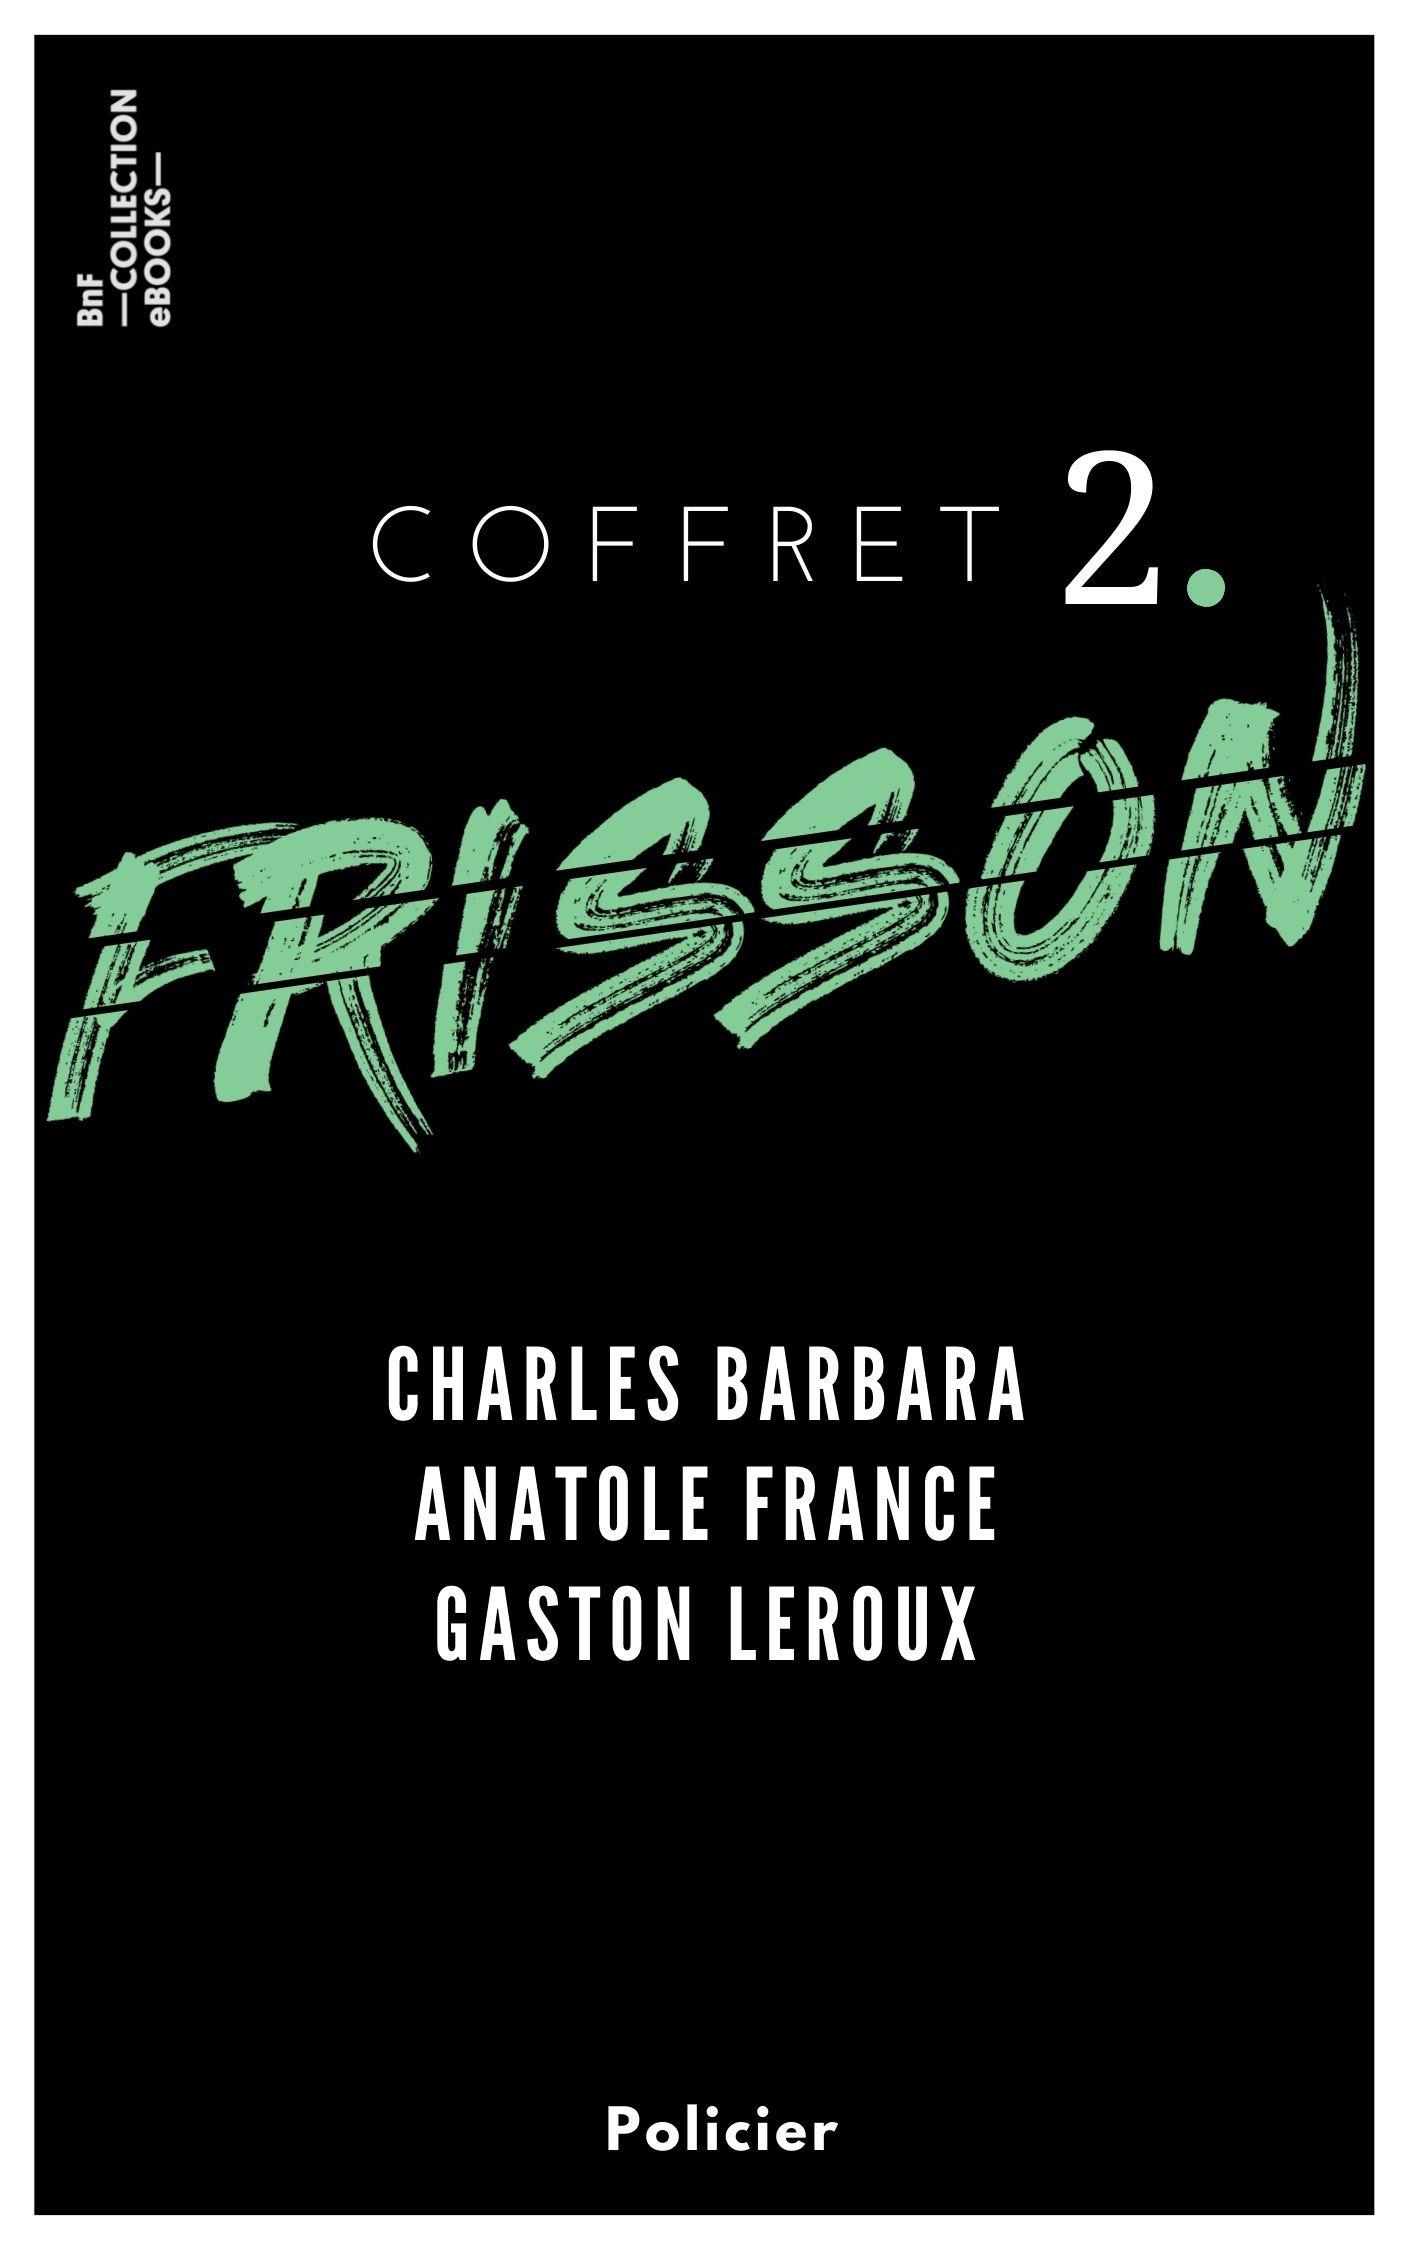 Coffret Frisson n°2 - Charles Barbara, Anatole France, Gaston Leroux